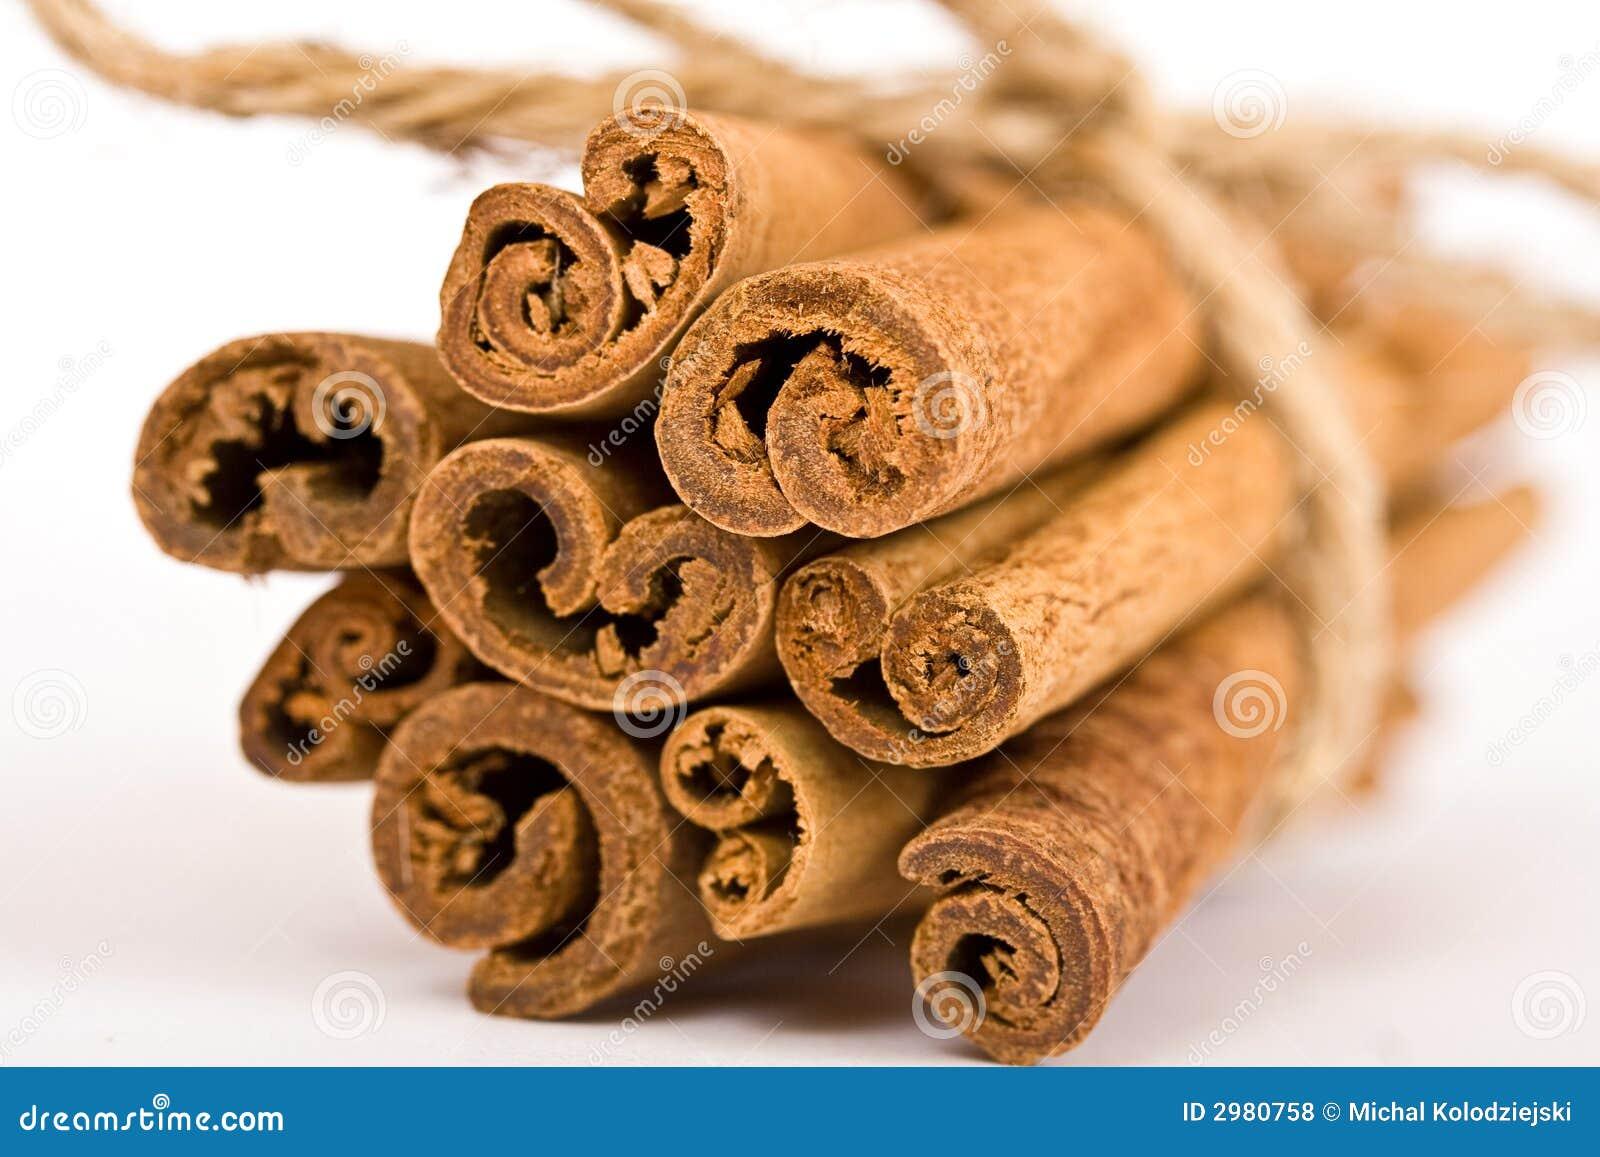 Cinnamon Spicy Sticks Close-up Stock Photo - Image of